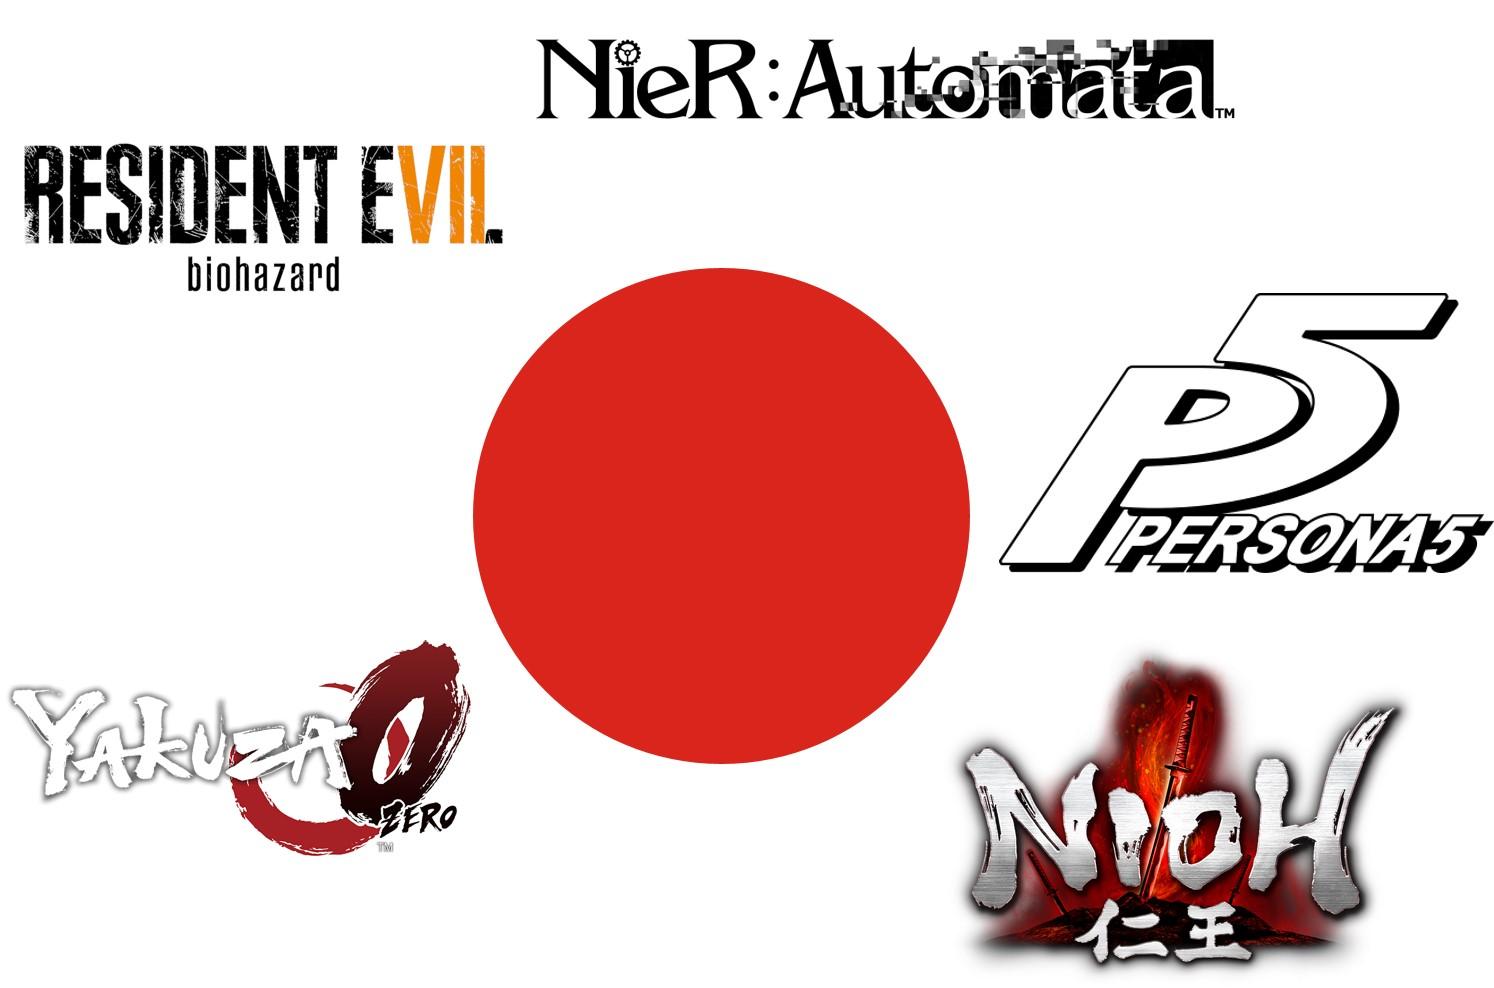 japanische spiele 2017 gaming rückblick 2017 gaming 2017 yakuza zero nioh nier automata resident evil 7 persona 5